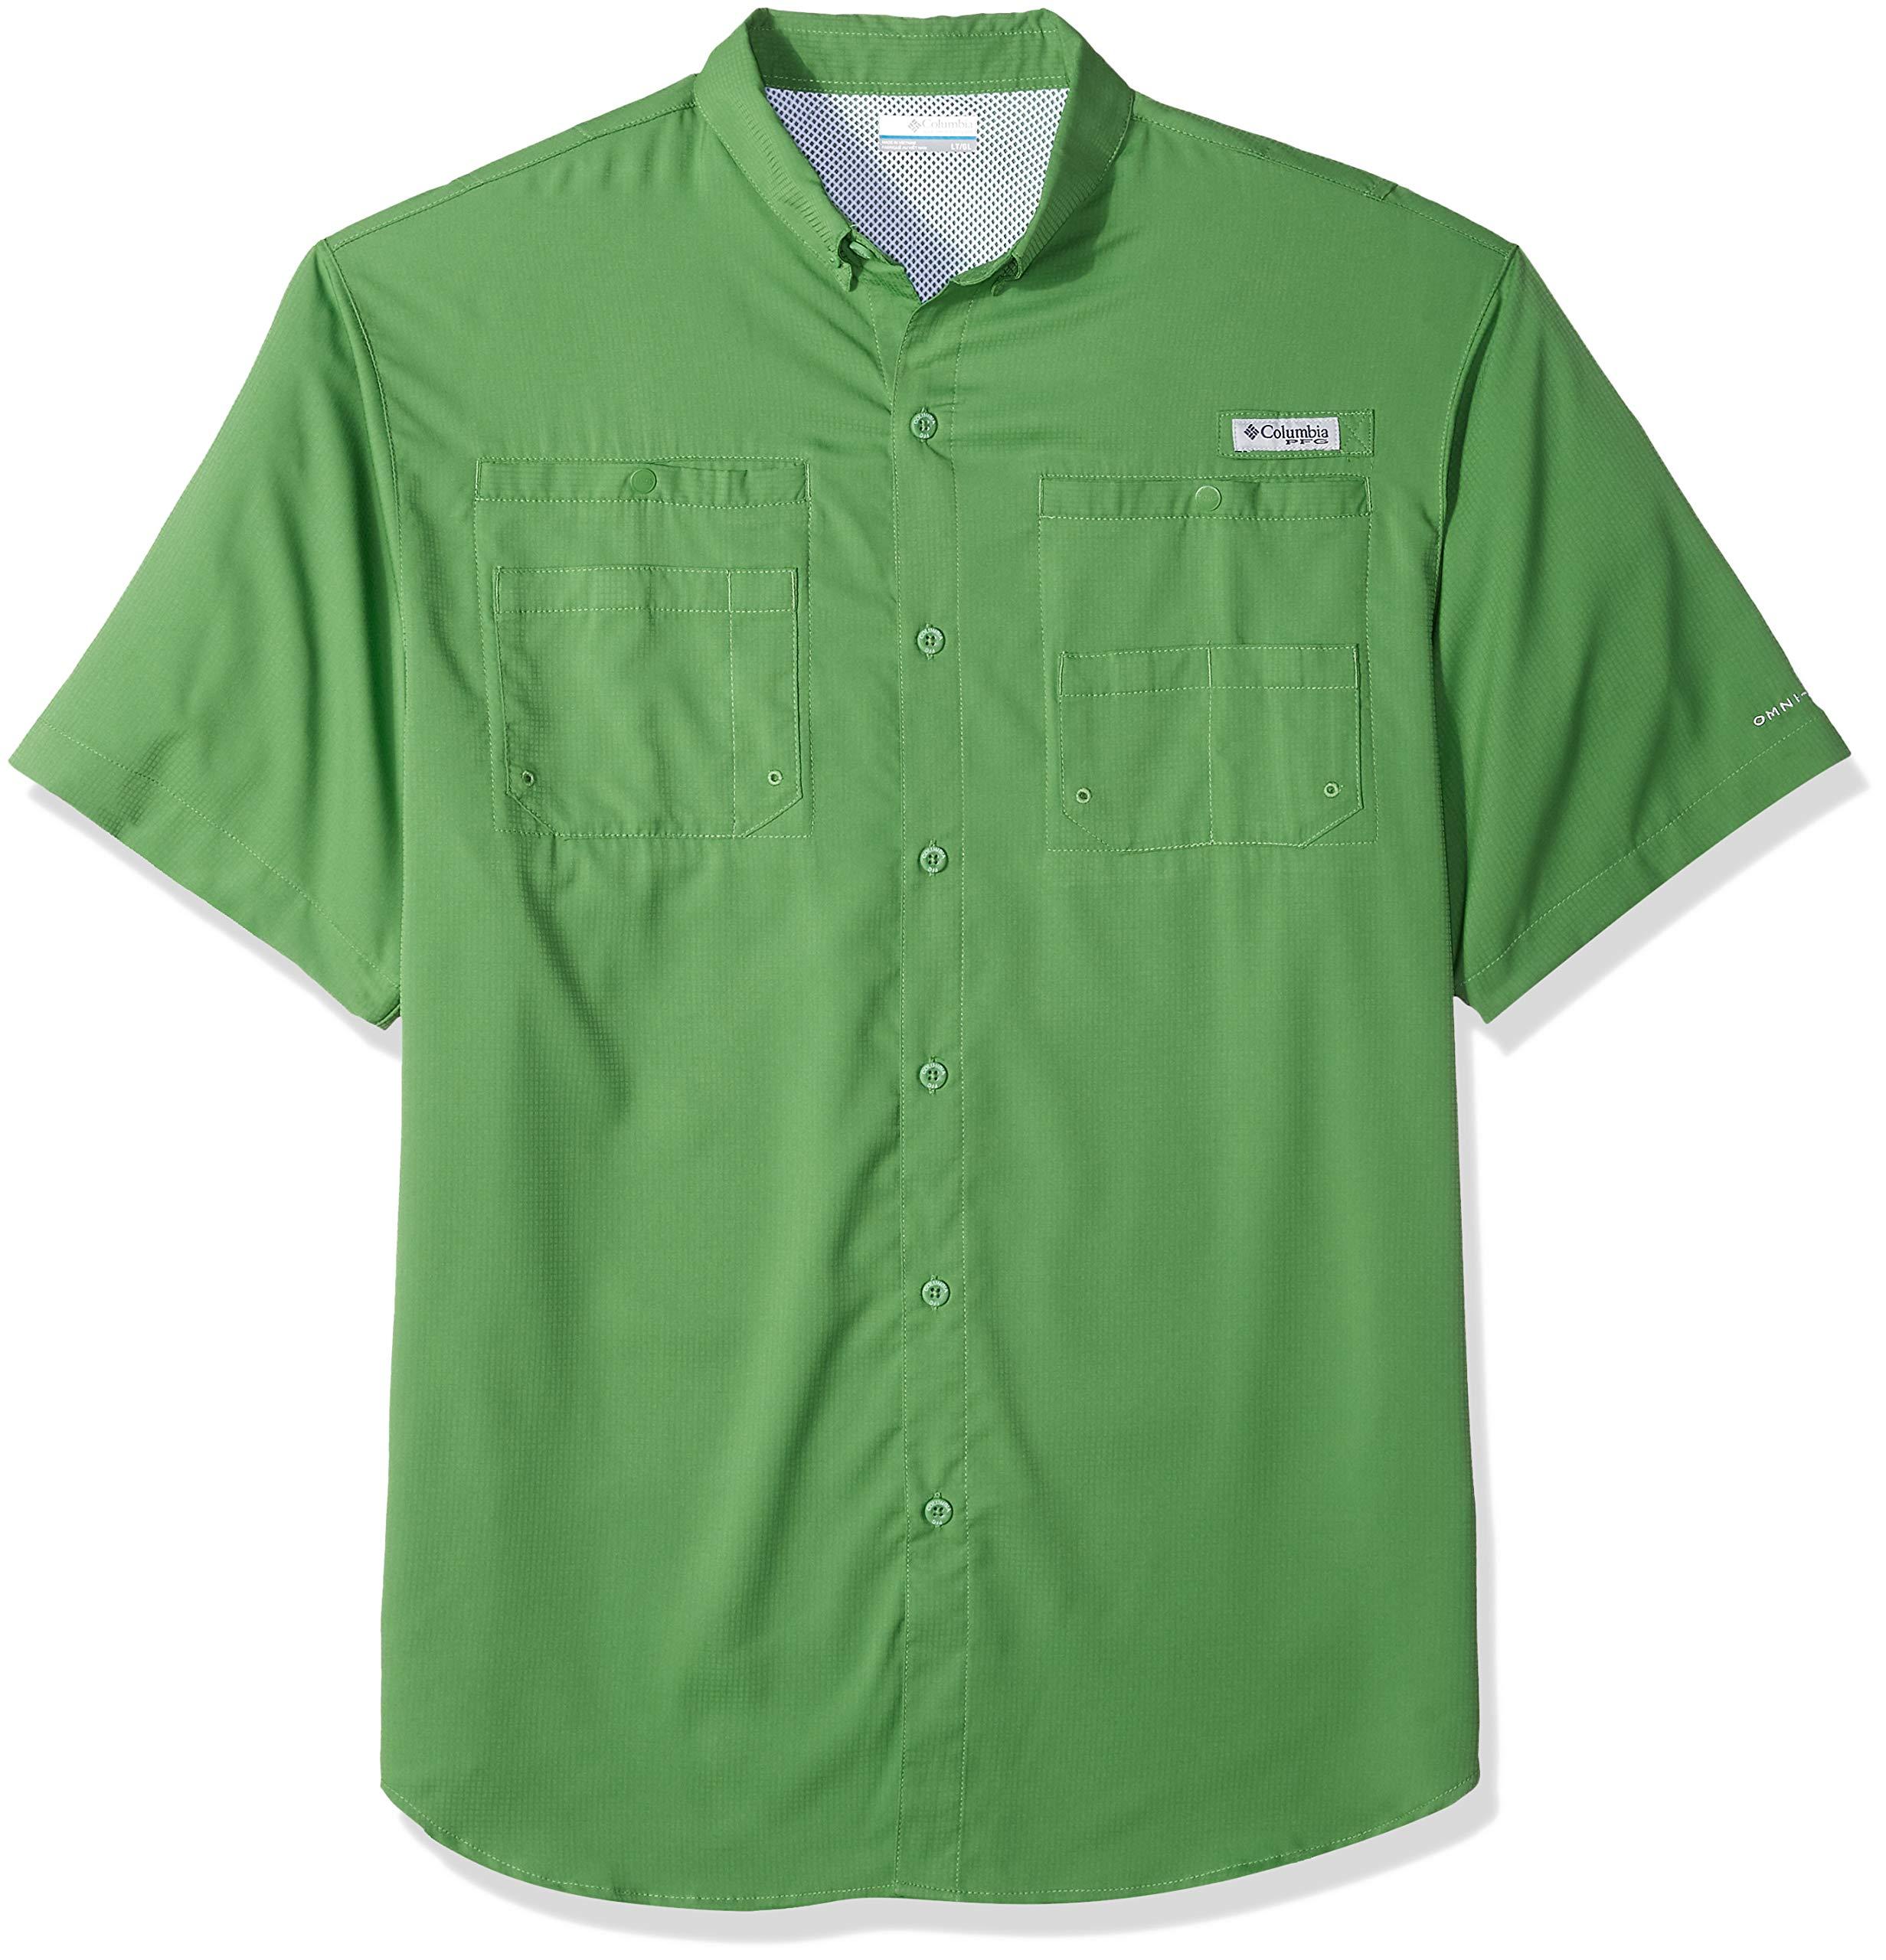 Columbia Men's Tamiami II Short Sleeve Fishing Shirt, Clean Green, 2XT